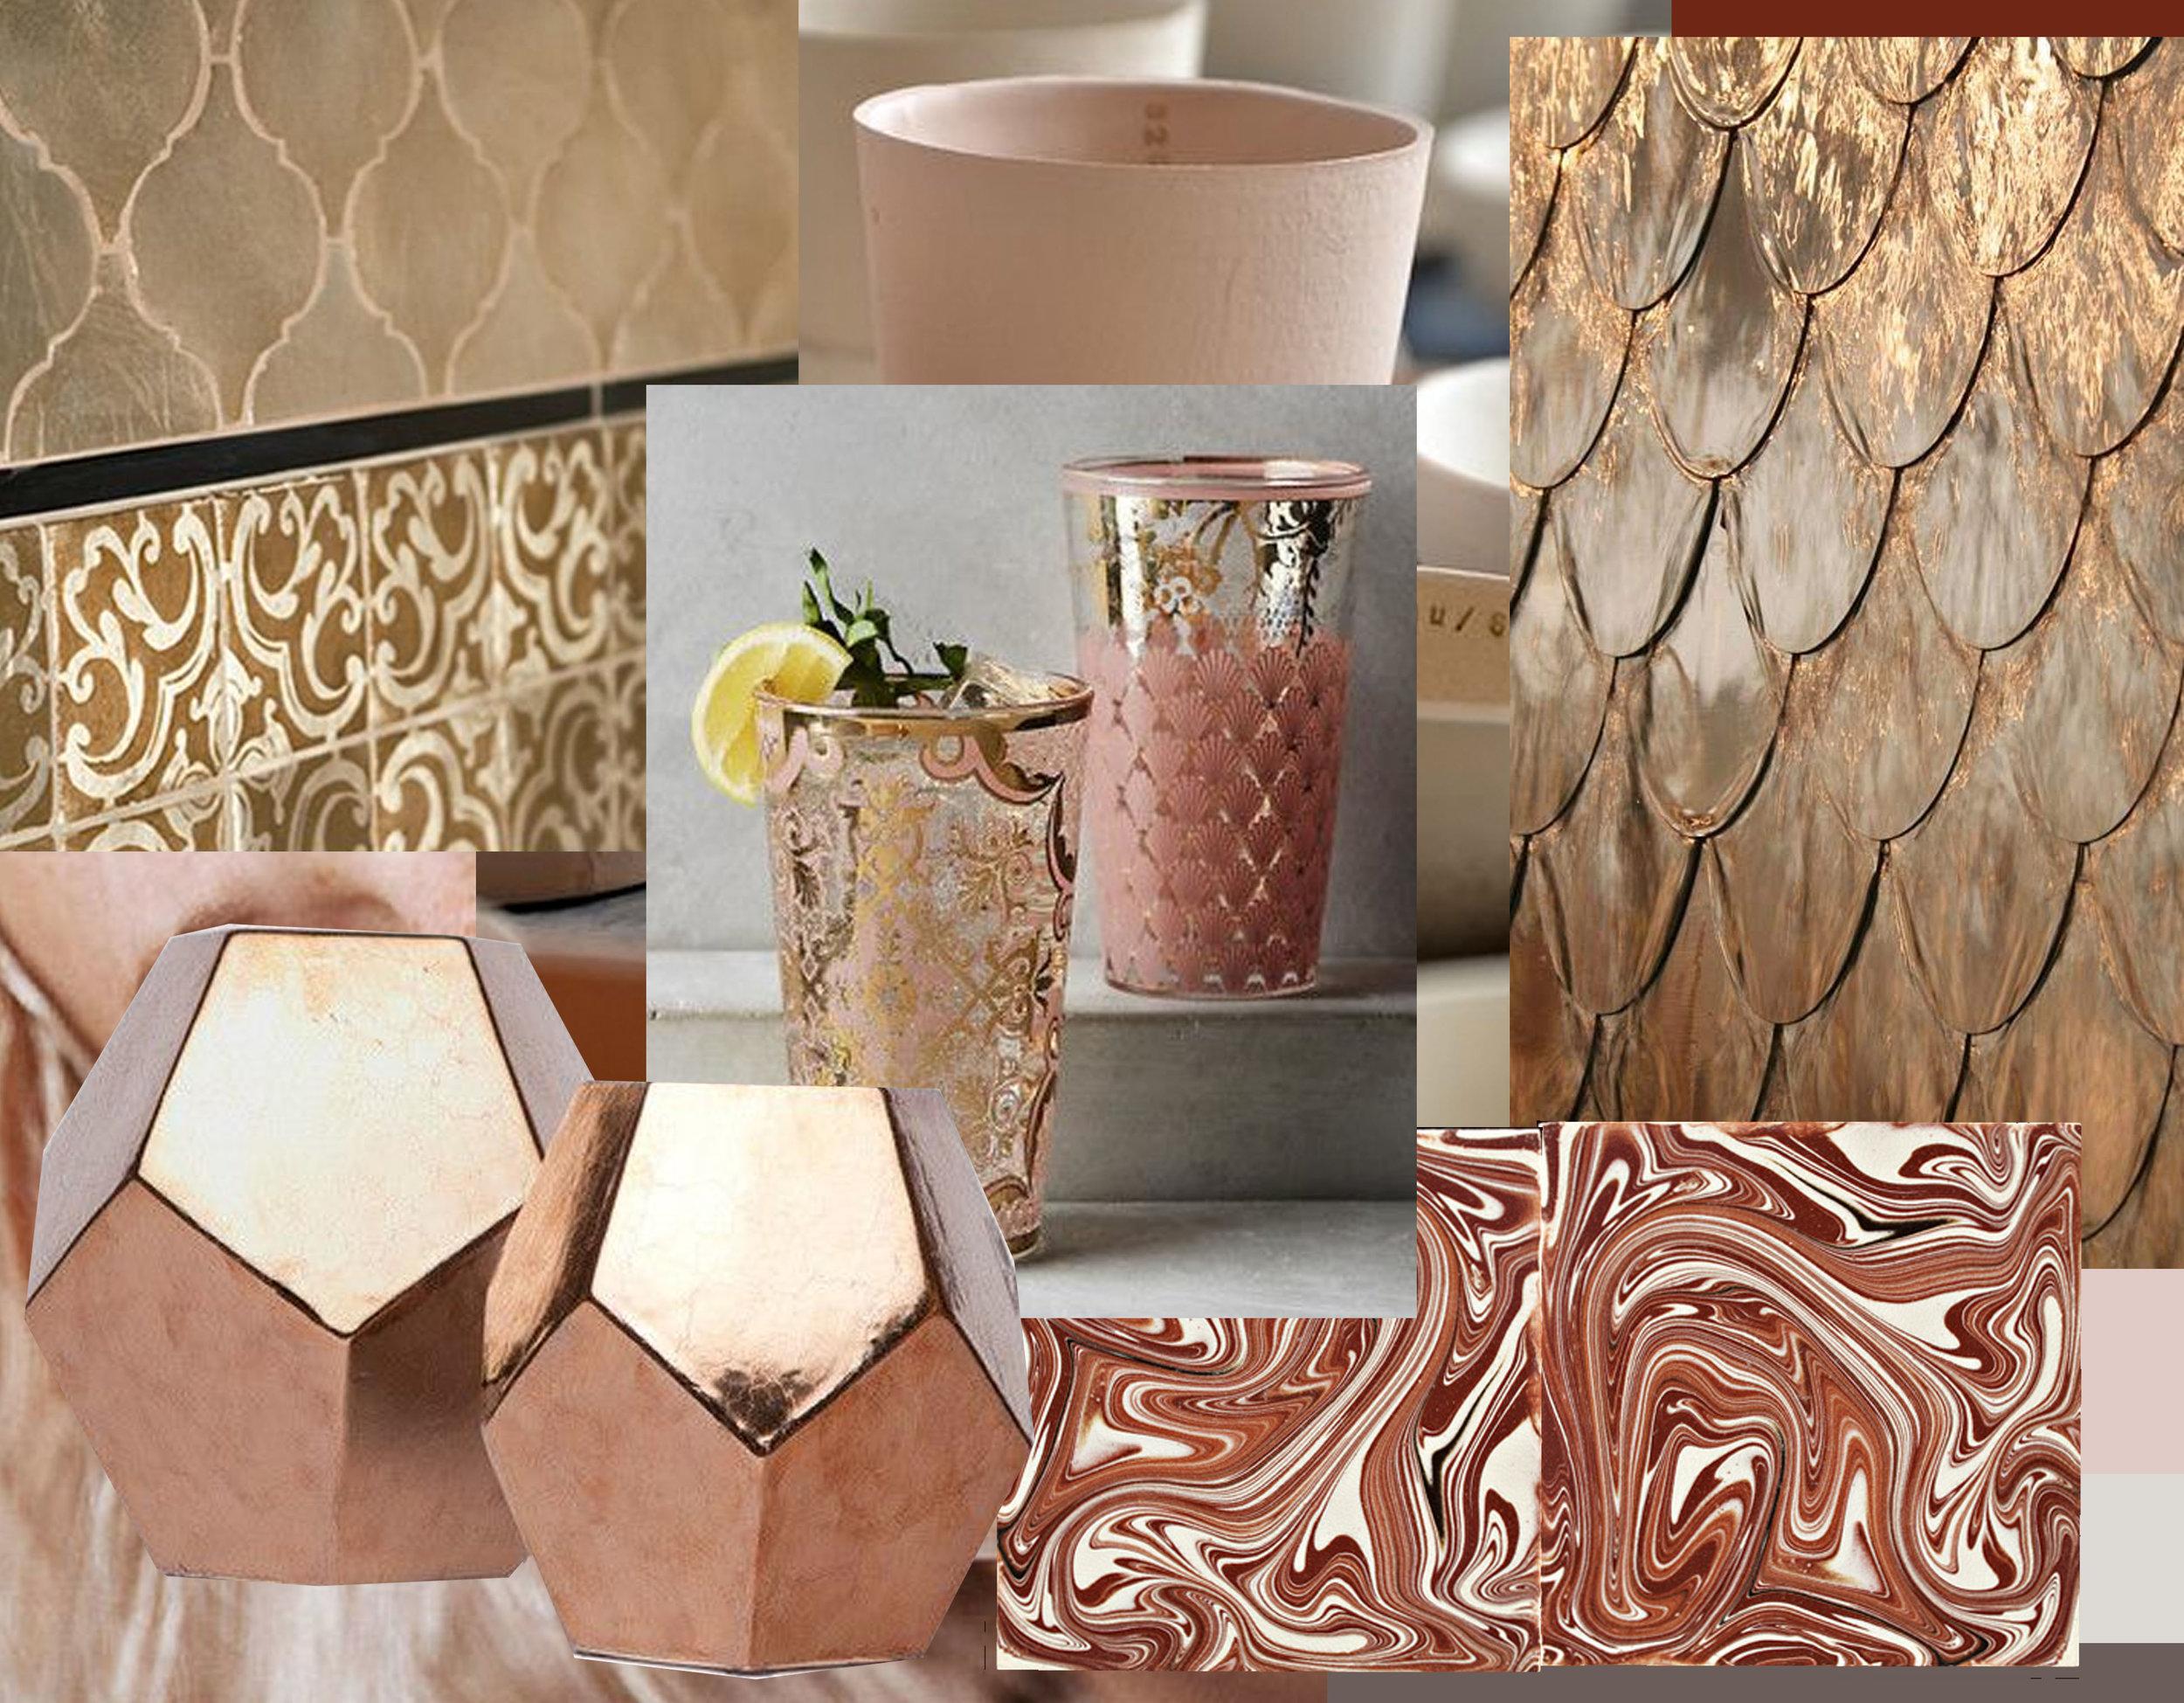 Contessa tiles  Walker Zanger - Renesse high glasses  Keep  - marbled tiles  De Ferranti - metal Petal Waterfall via  Sors